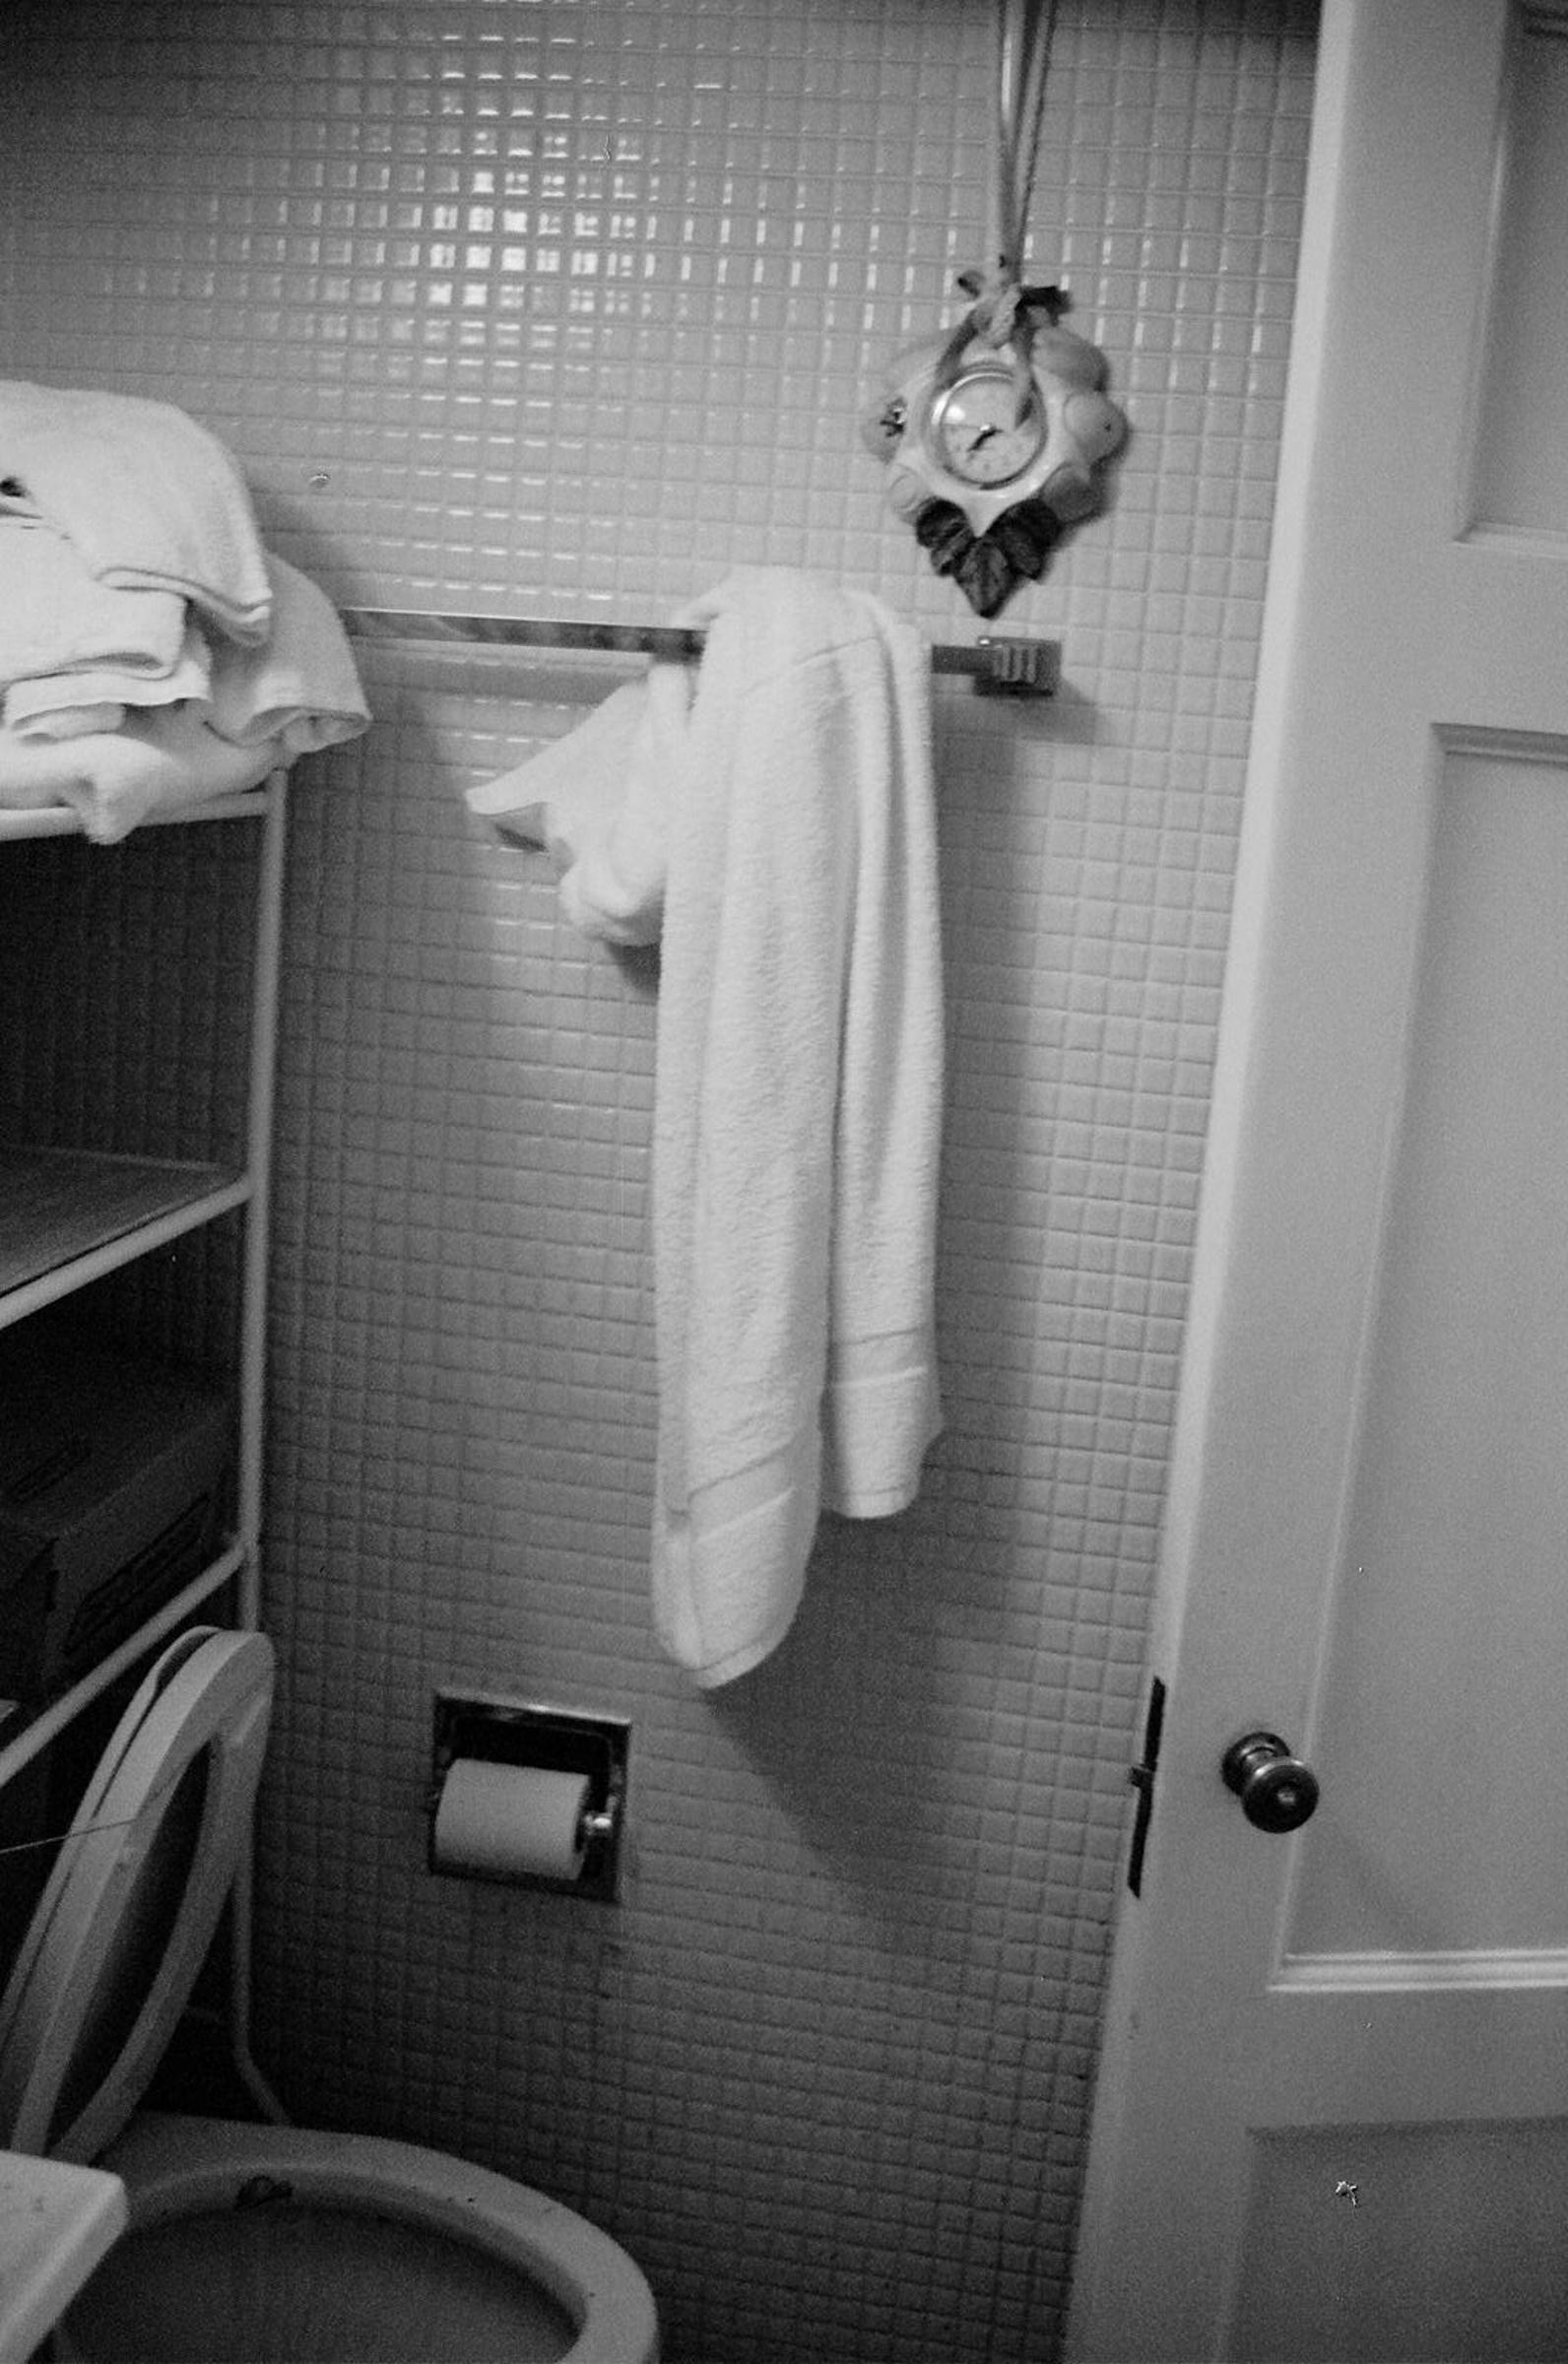 untouched bathroom after grandpas death